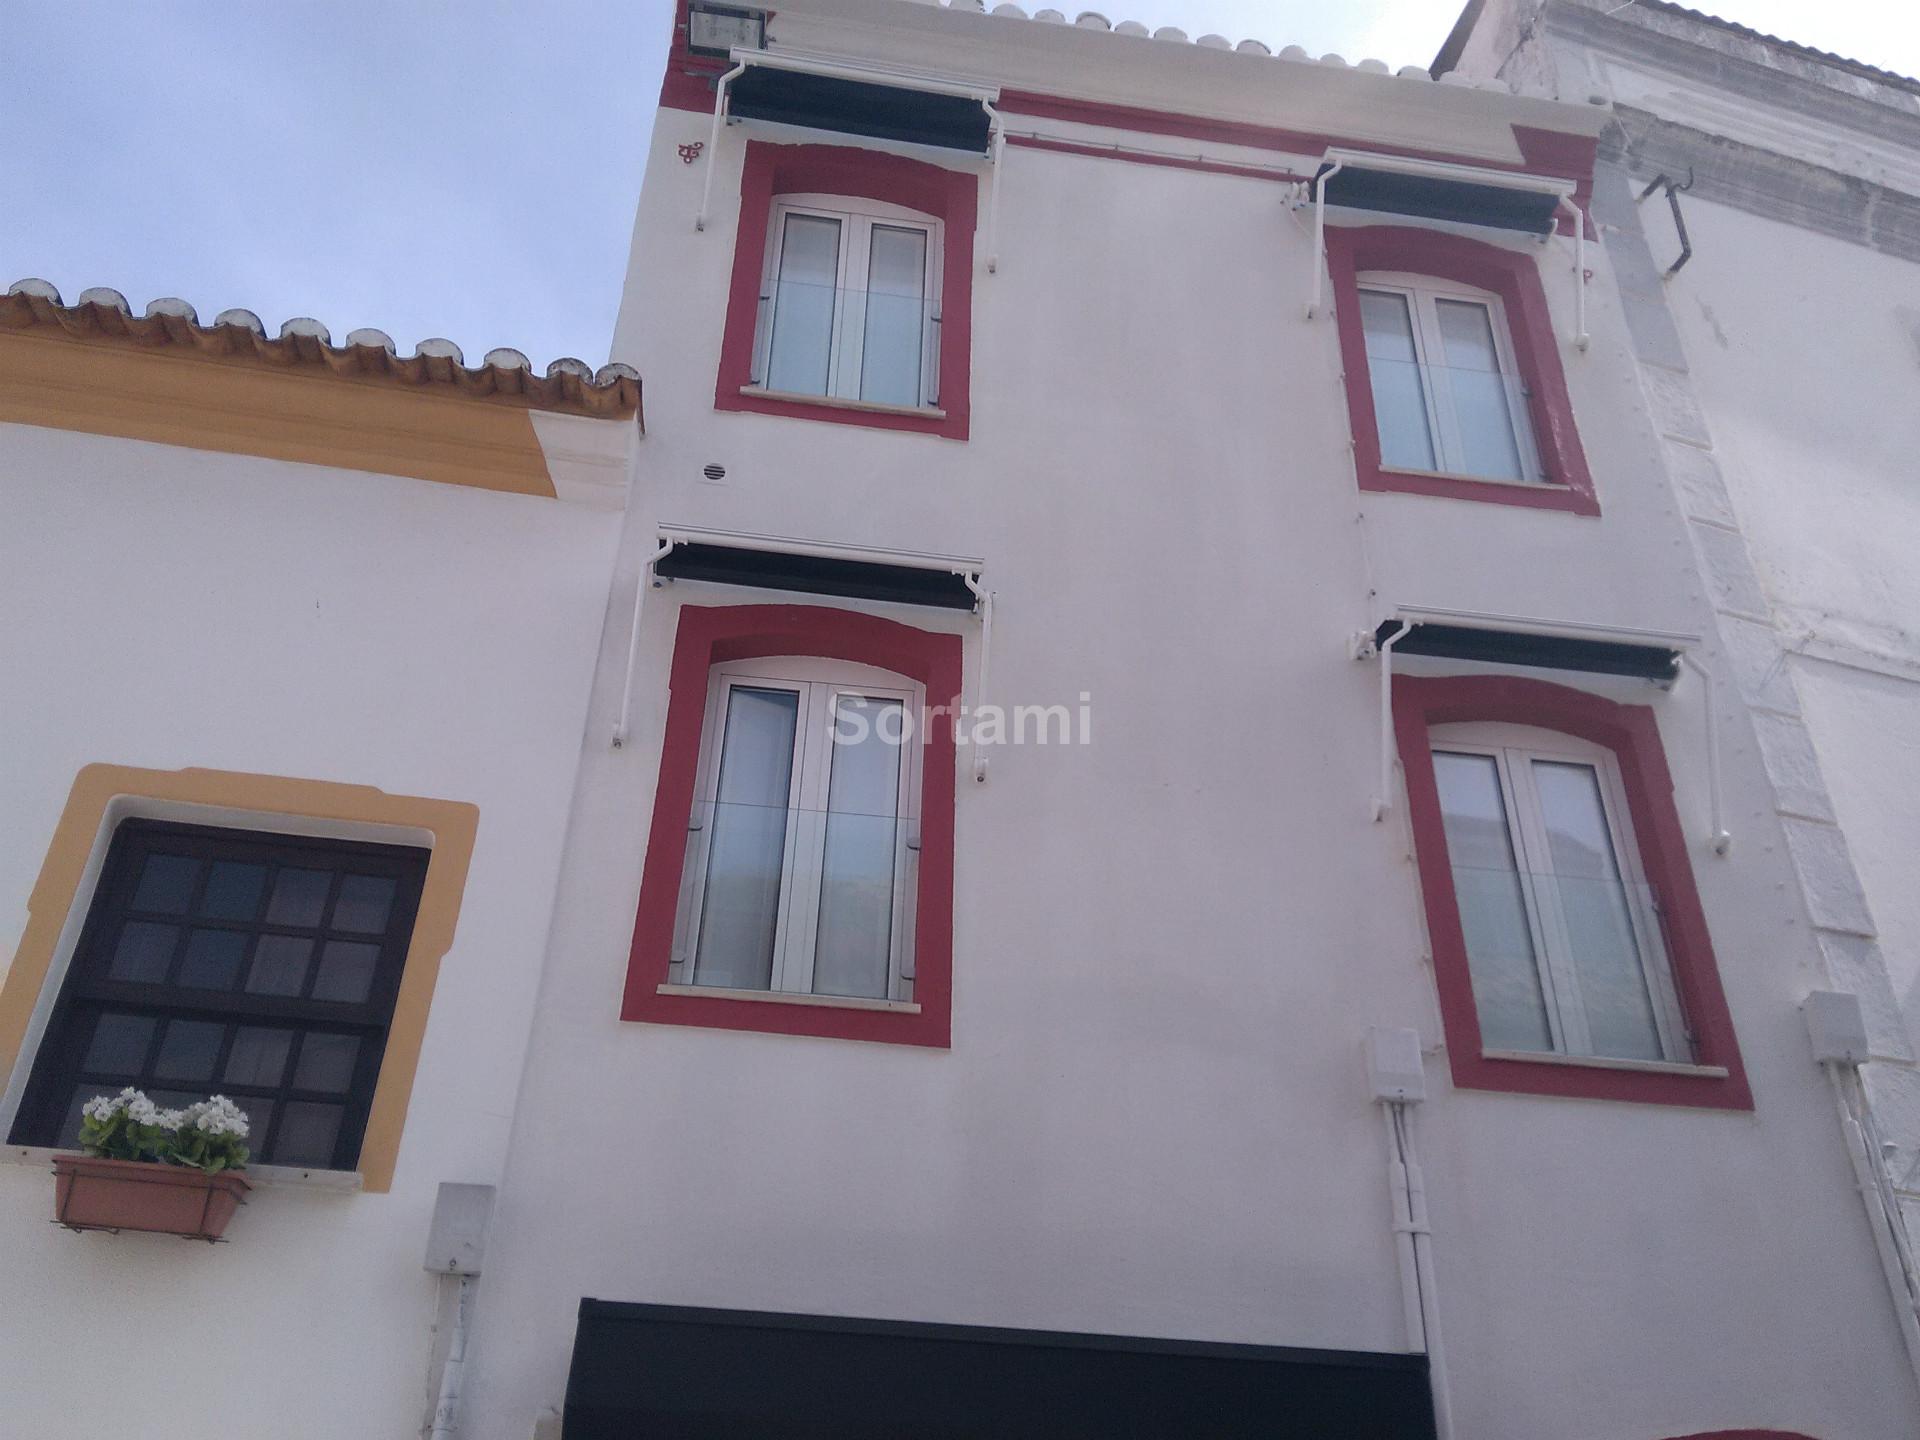 Town House T2, Algarve, Albufeira